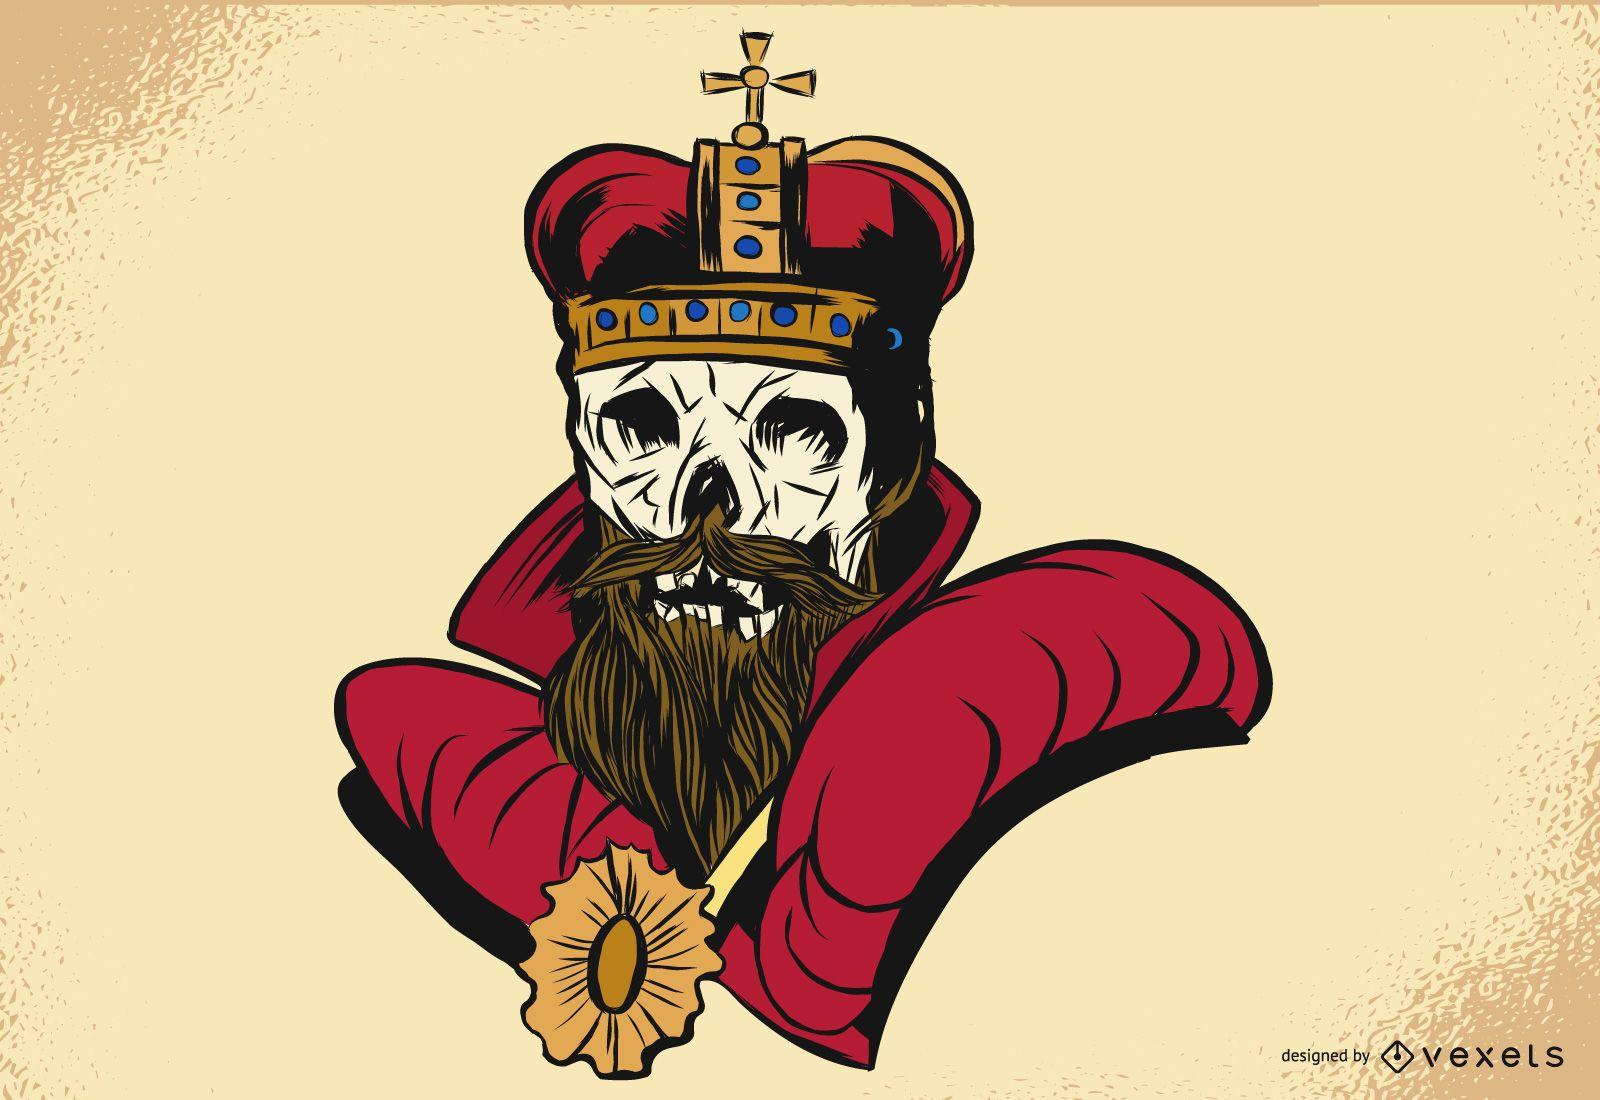 Skeleton king illustration design